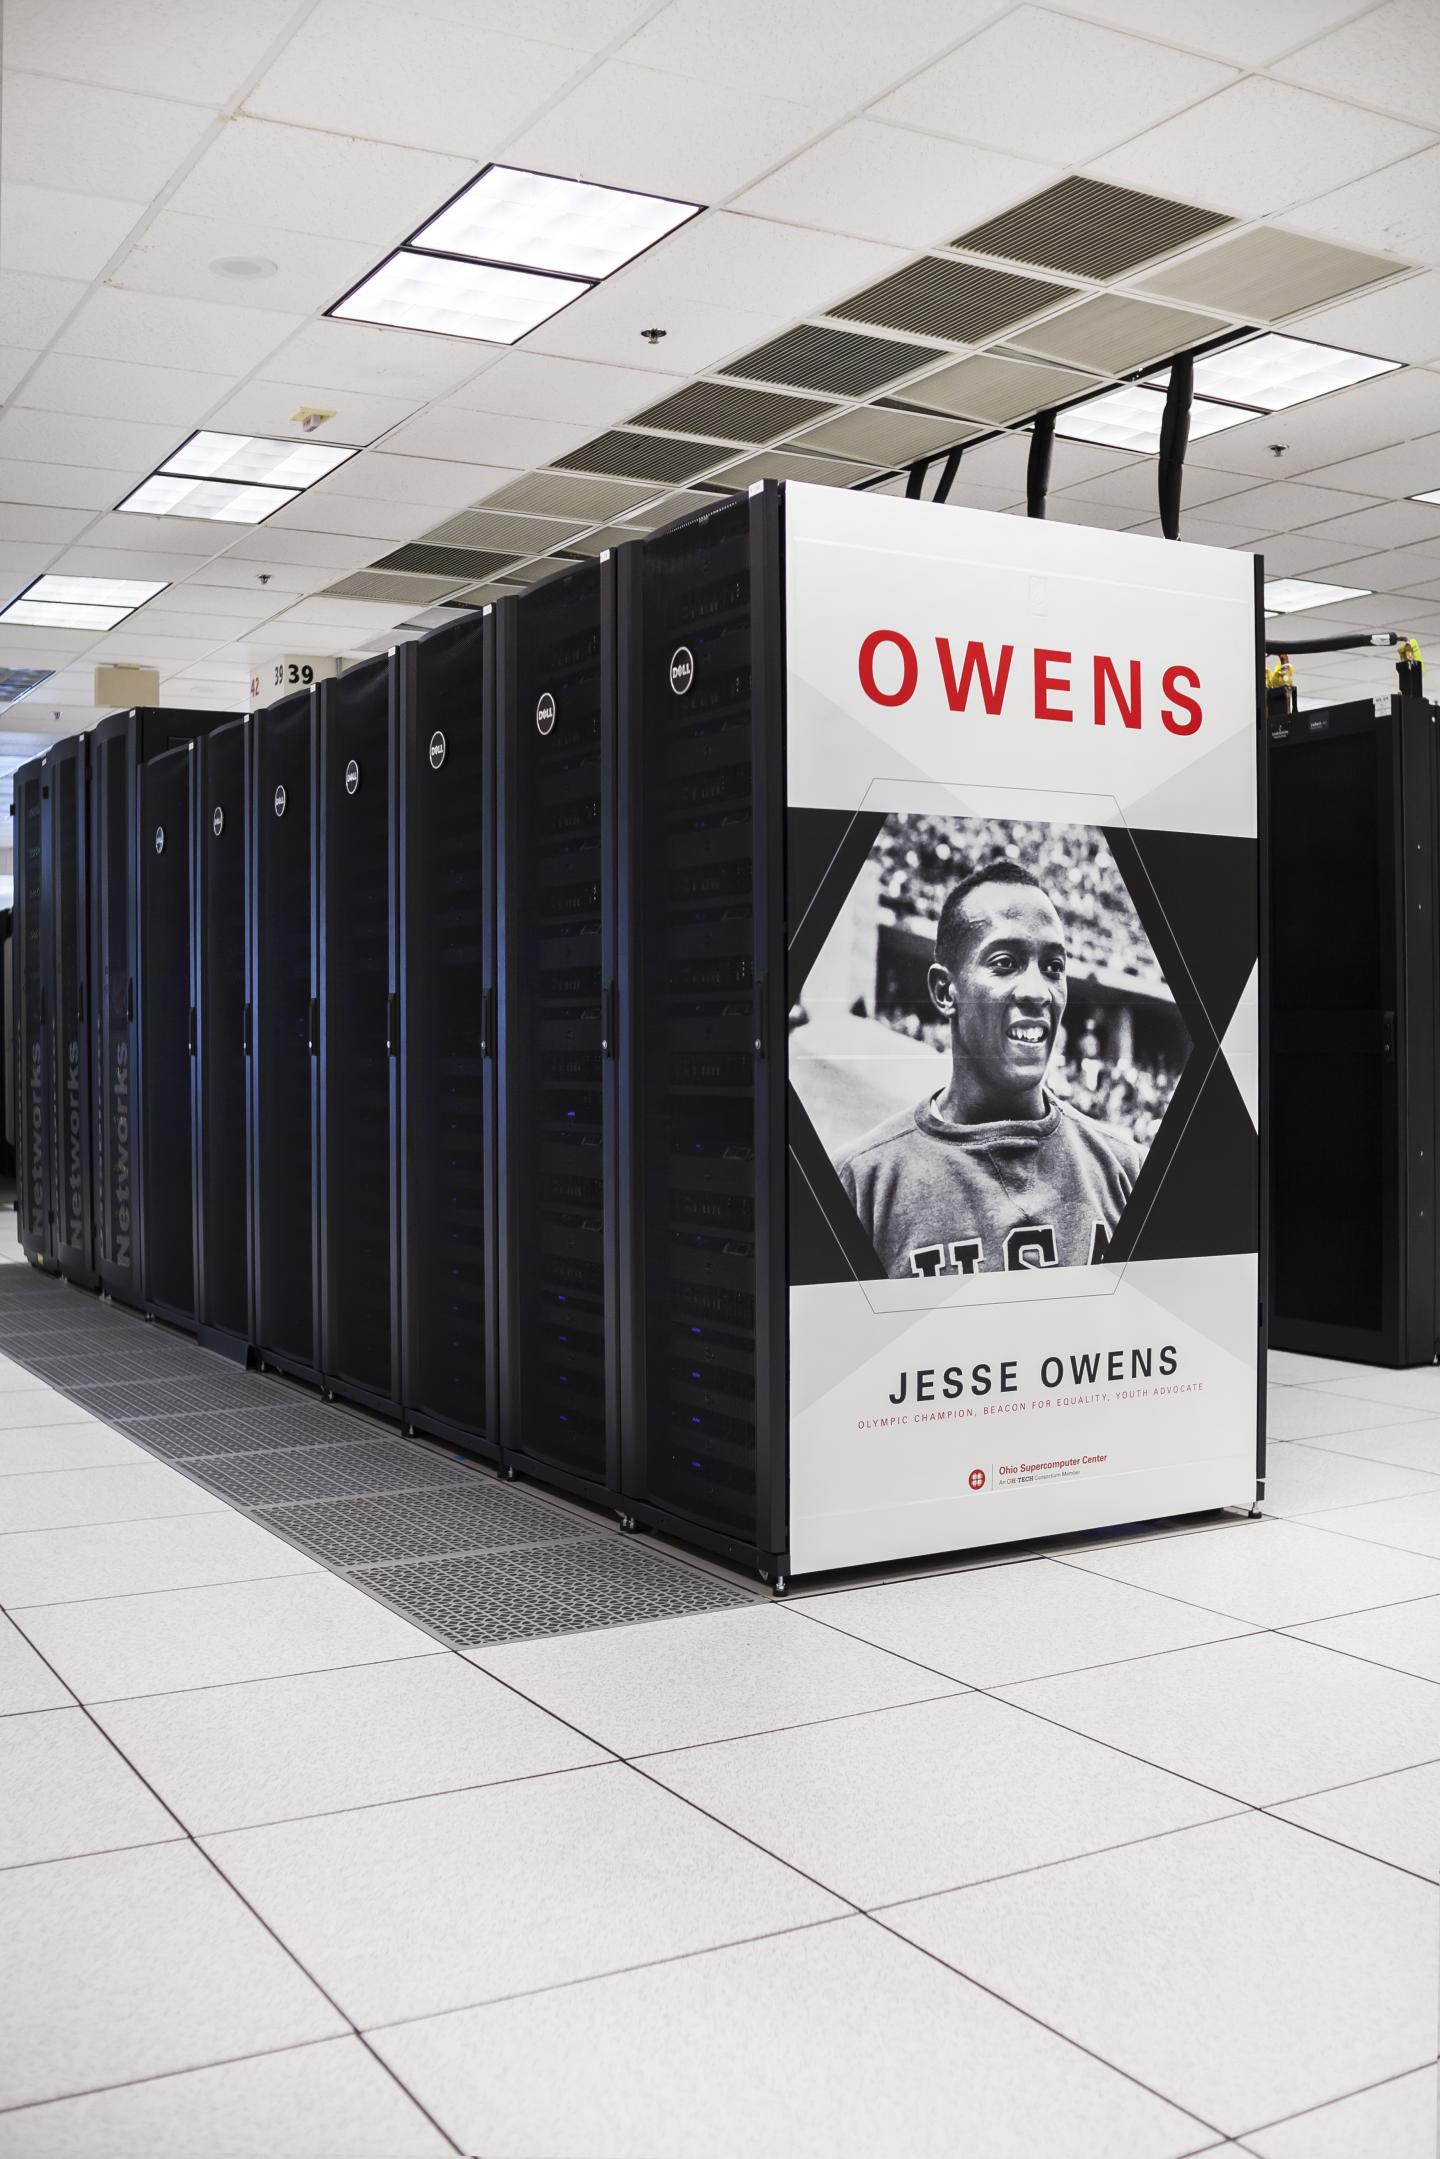 Owens Cluster